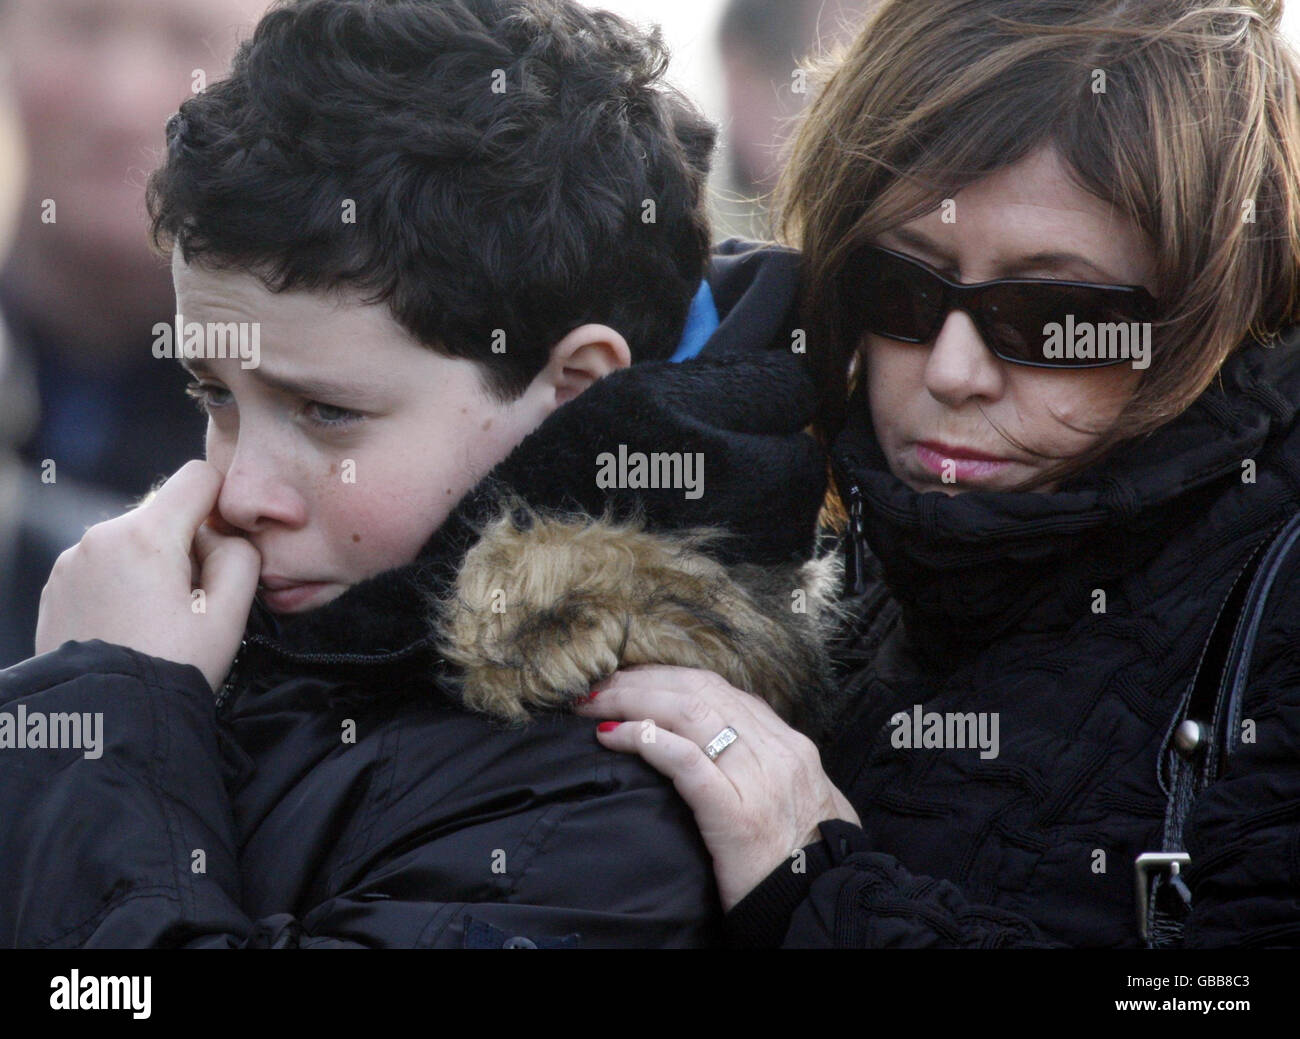 Lockerbie anniversary - Stock Image